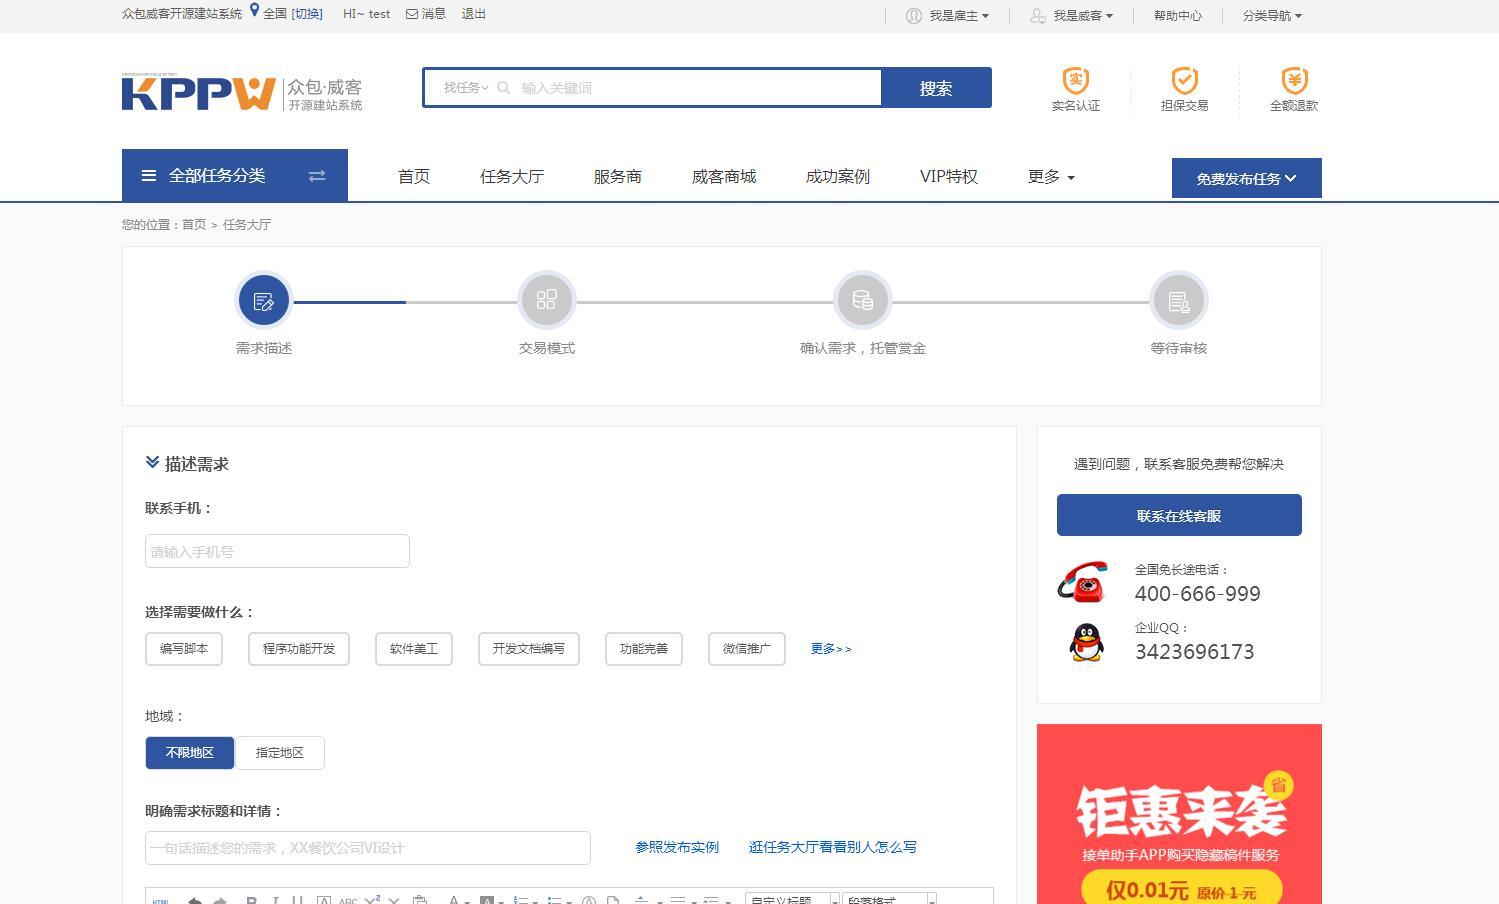 KPPW客客威客V3.3众包发布任务接单平台源码运营版-米酷主题